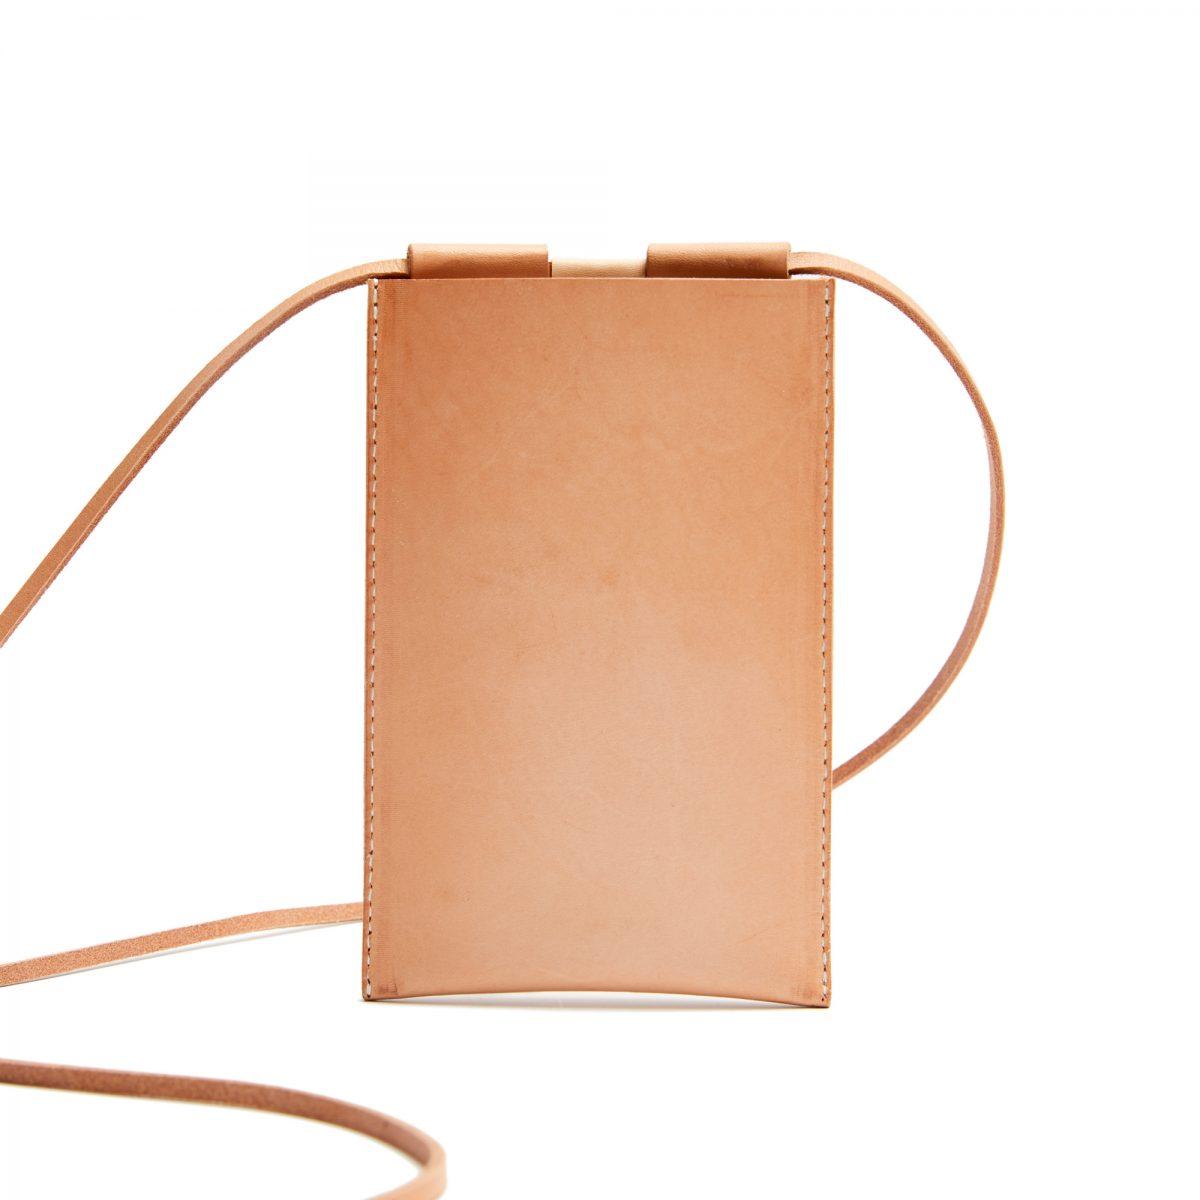 Phone bag by Studio Rosanne Bergsma